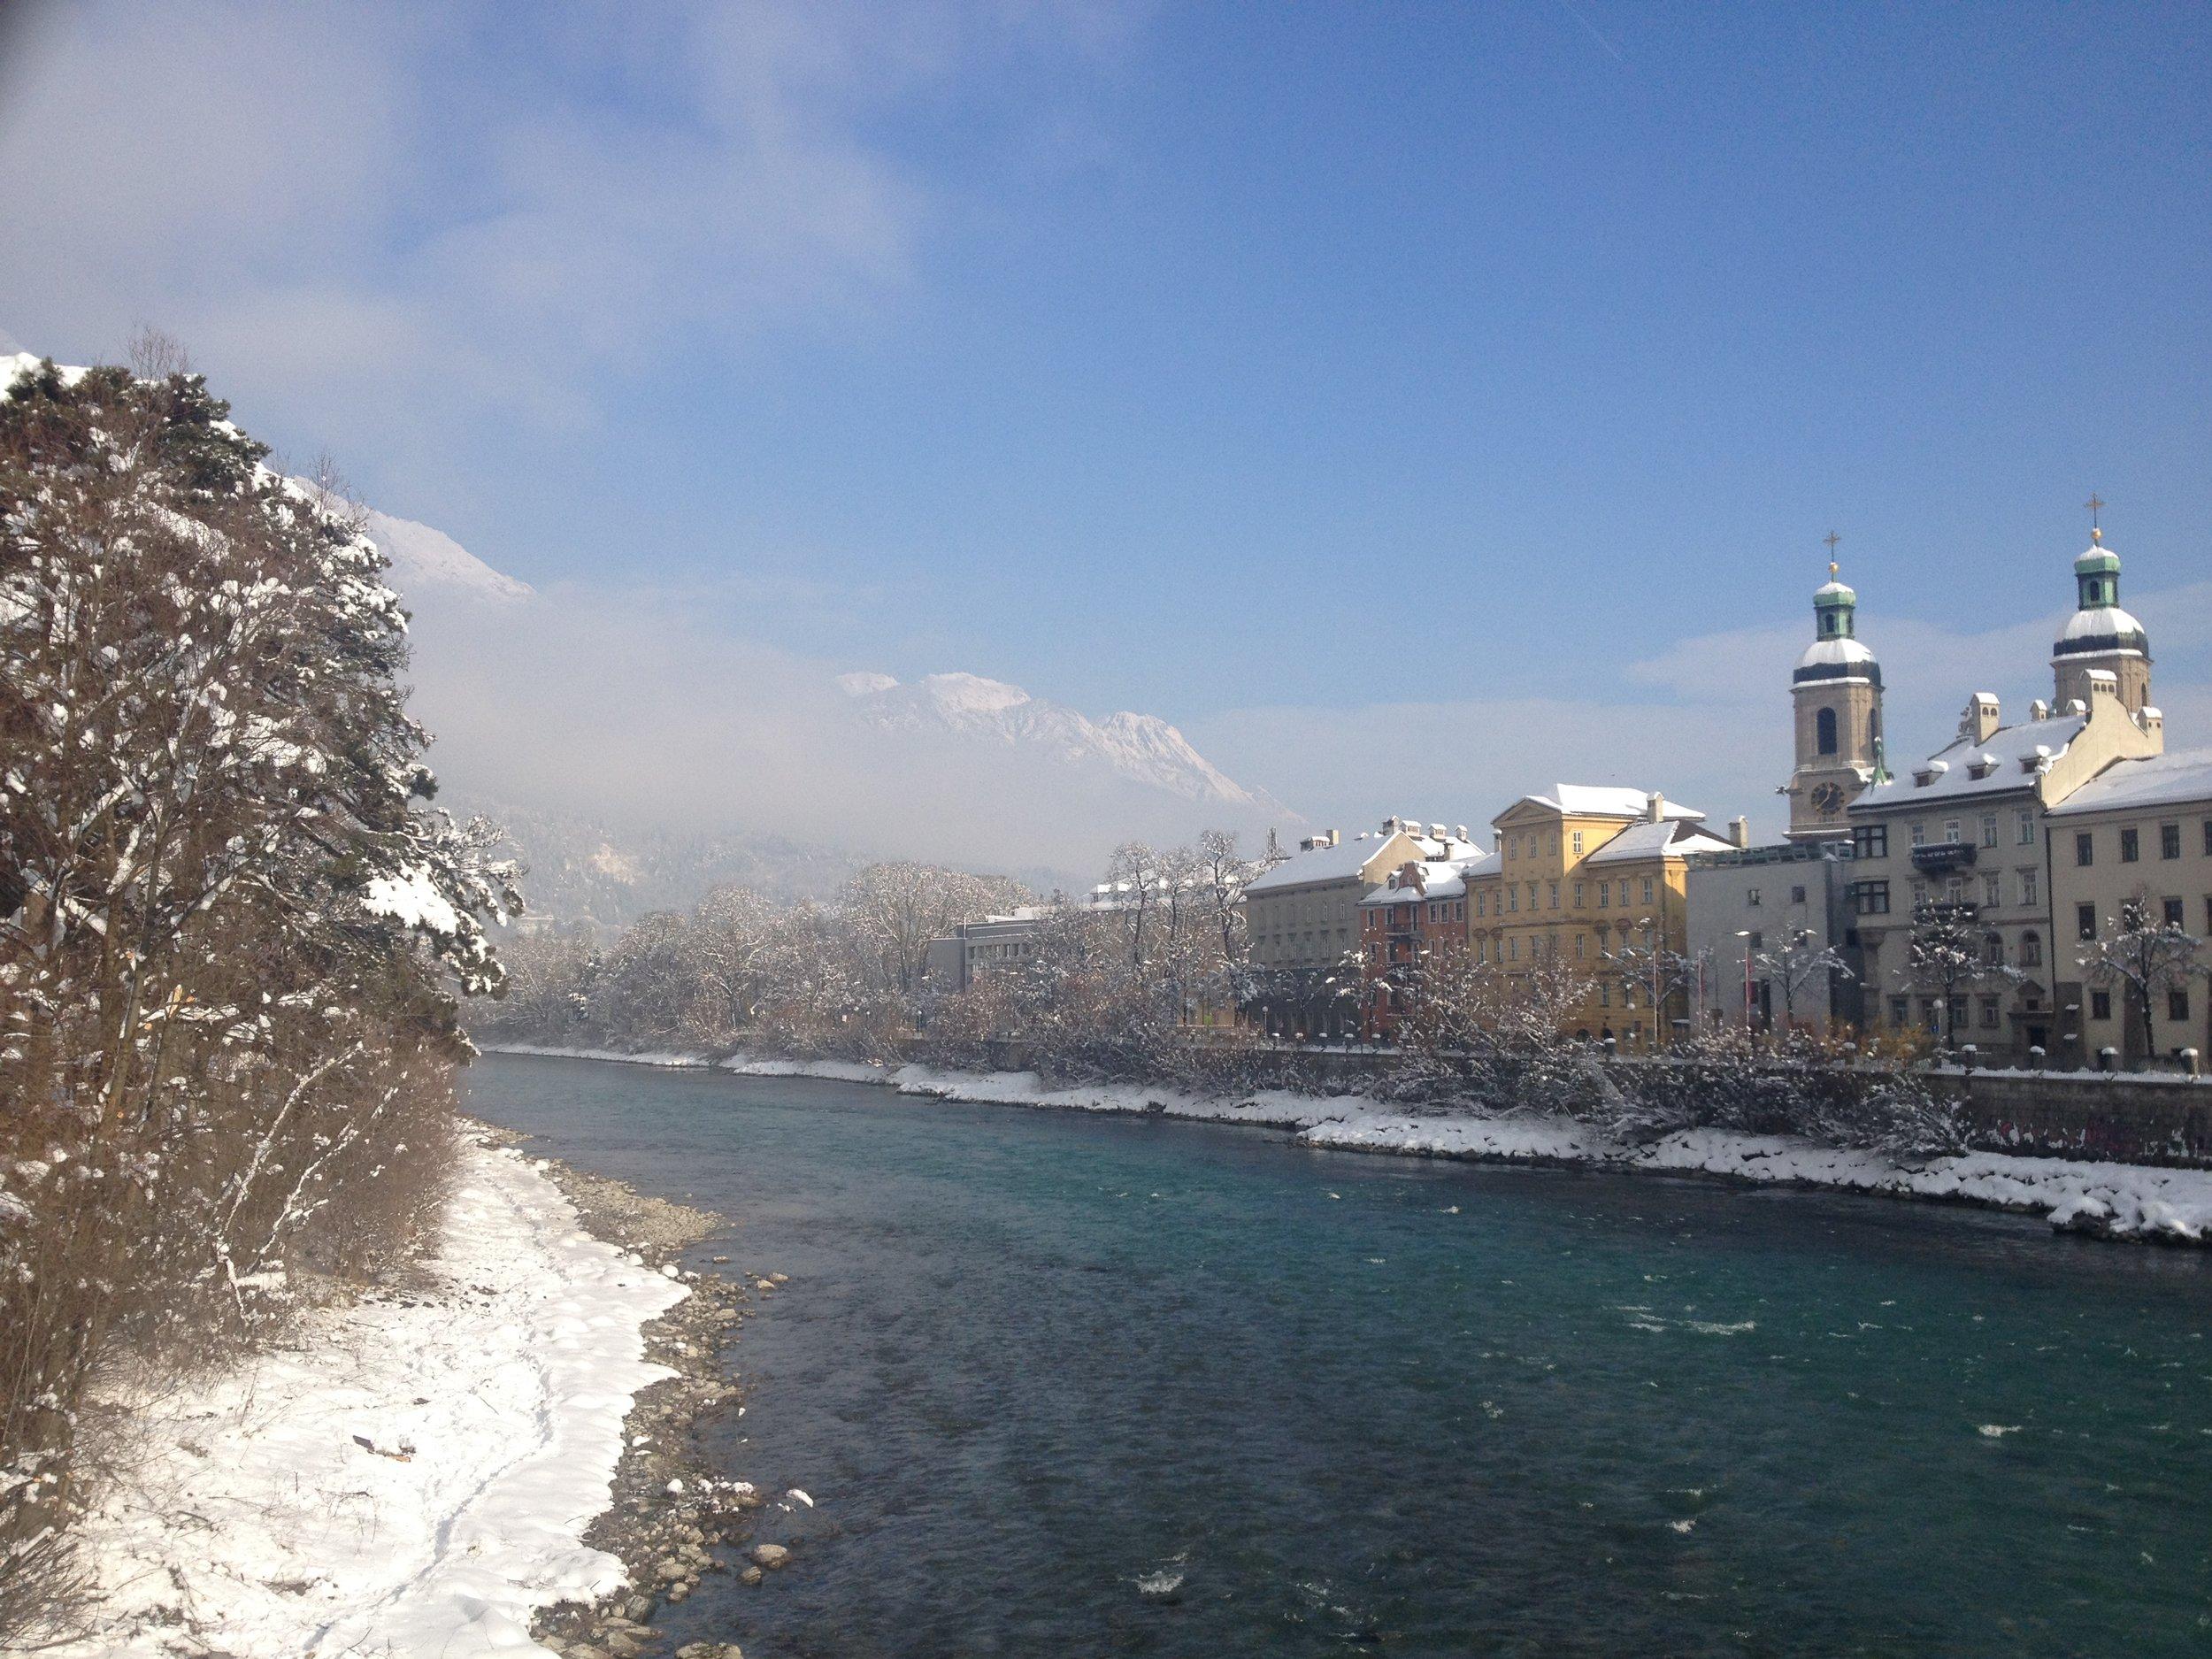 Cold, snowy morning in Innsbruck, Austria